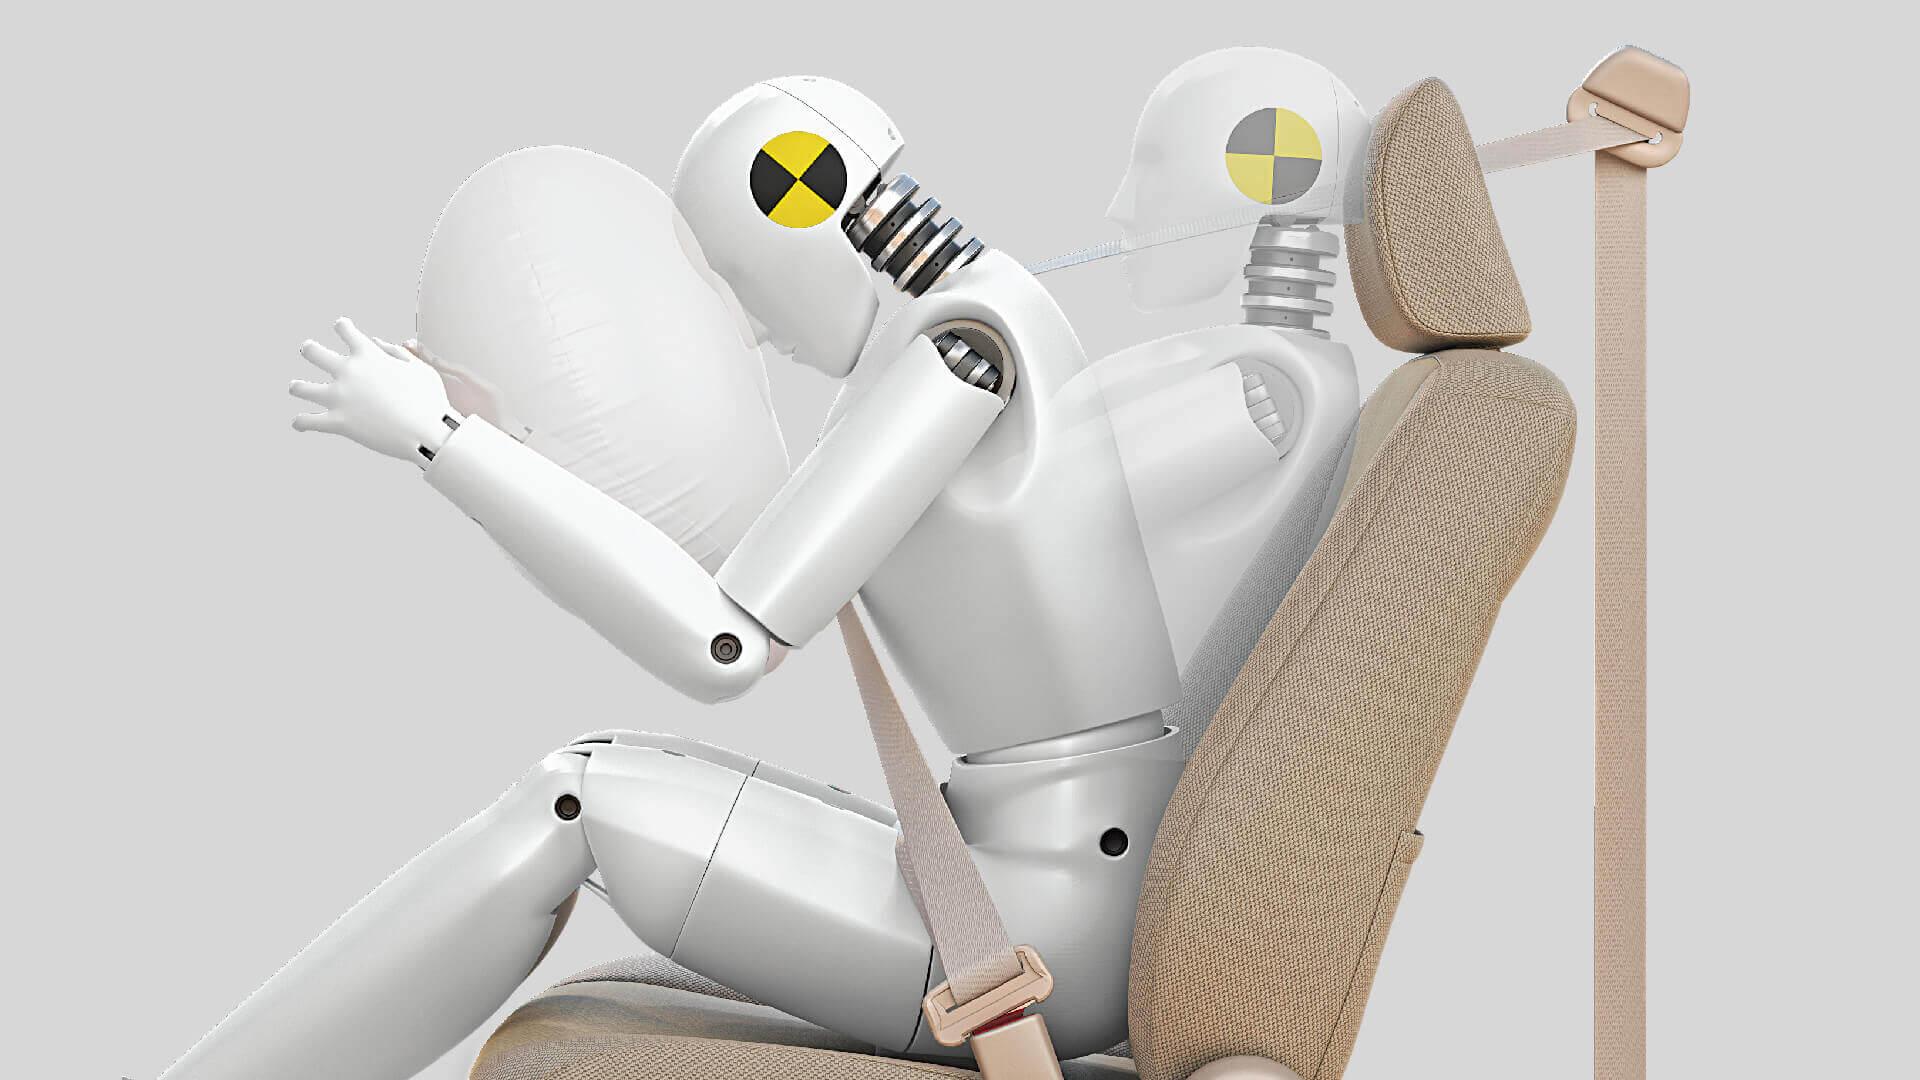 etios-front-pre-tensioner-force-limiter-seat-belt